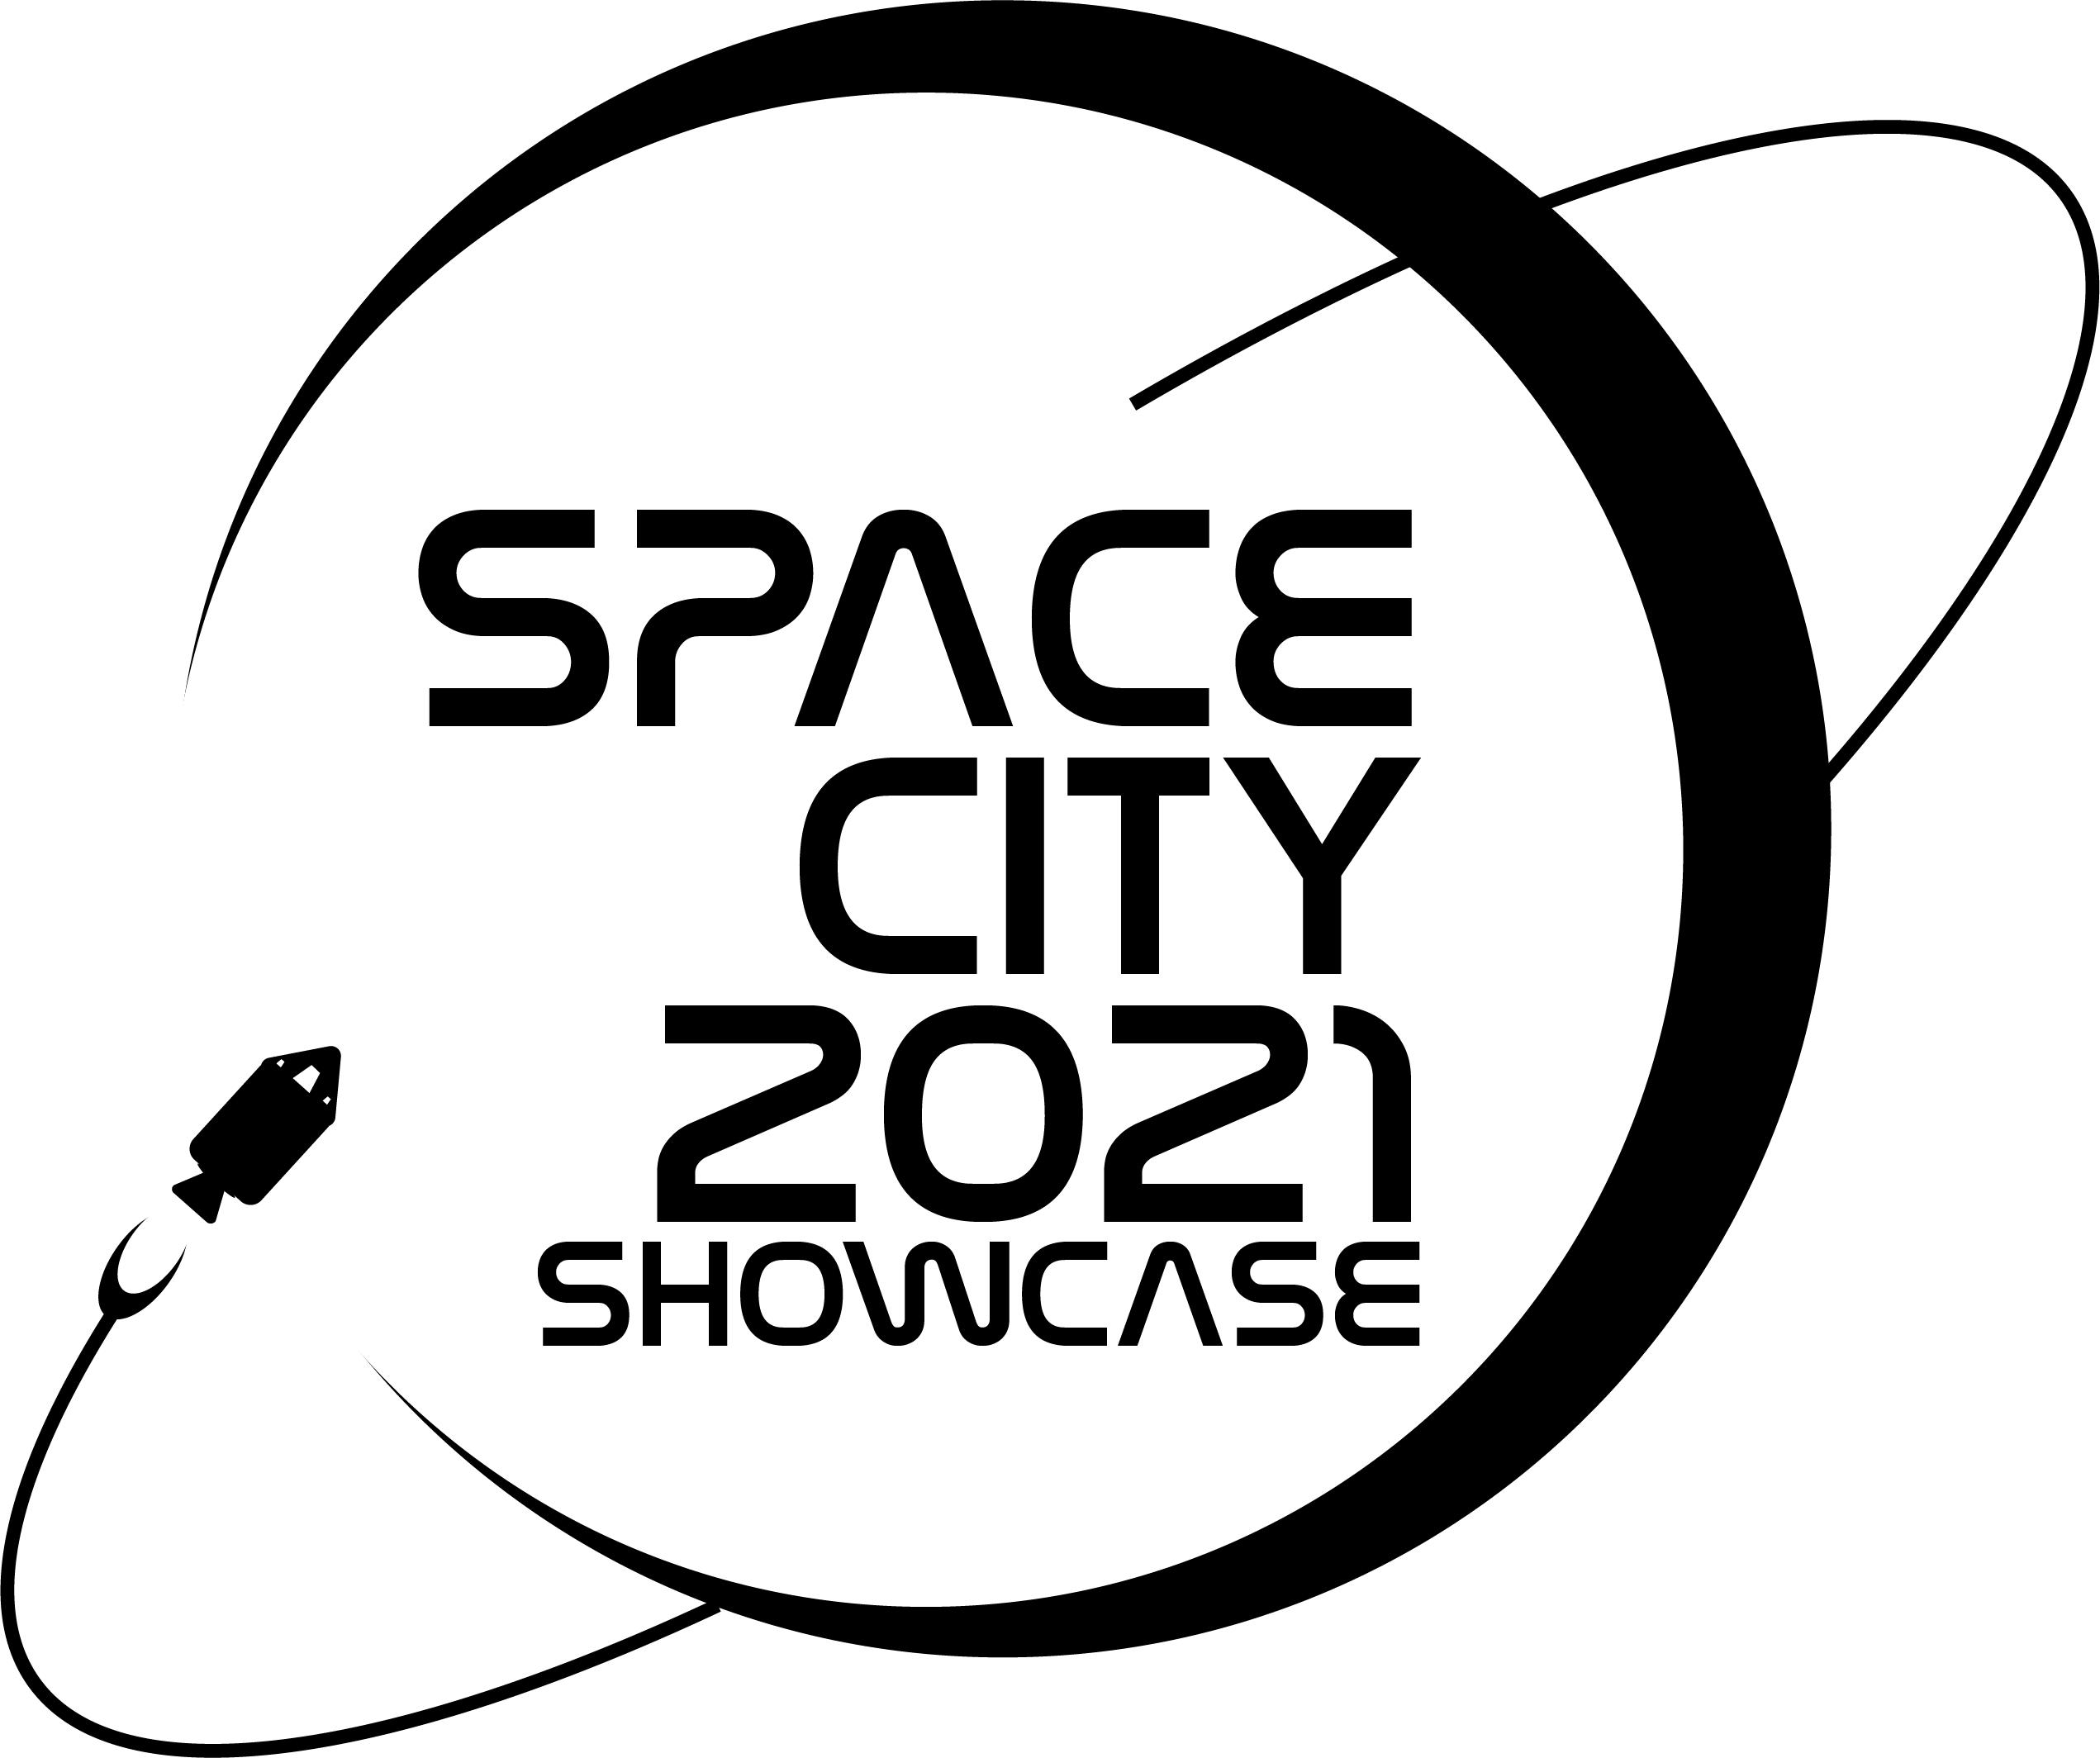 Showcase: Space City VEX IQ Elementary